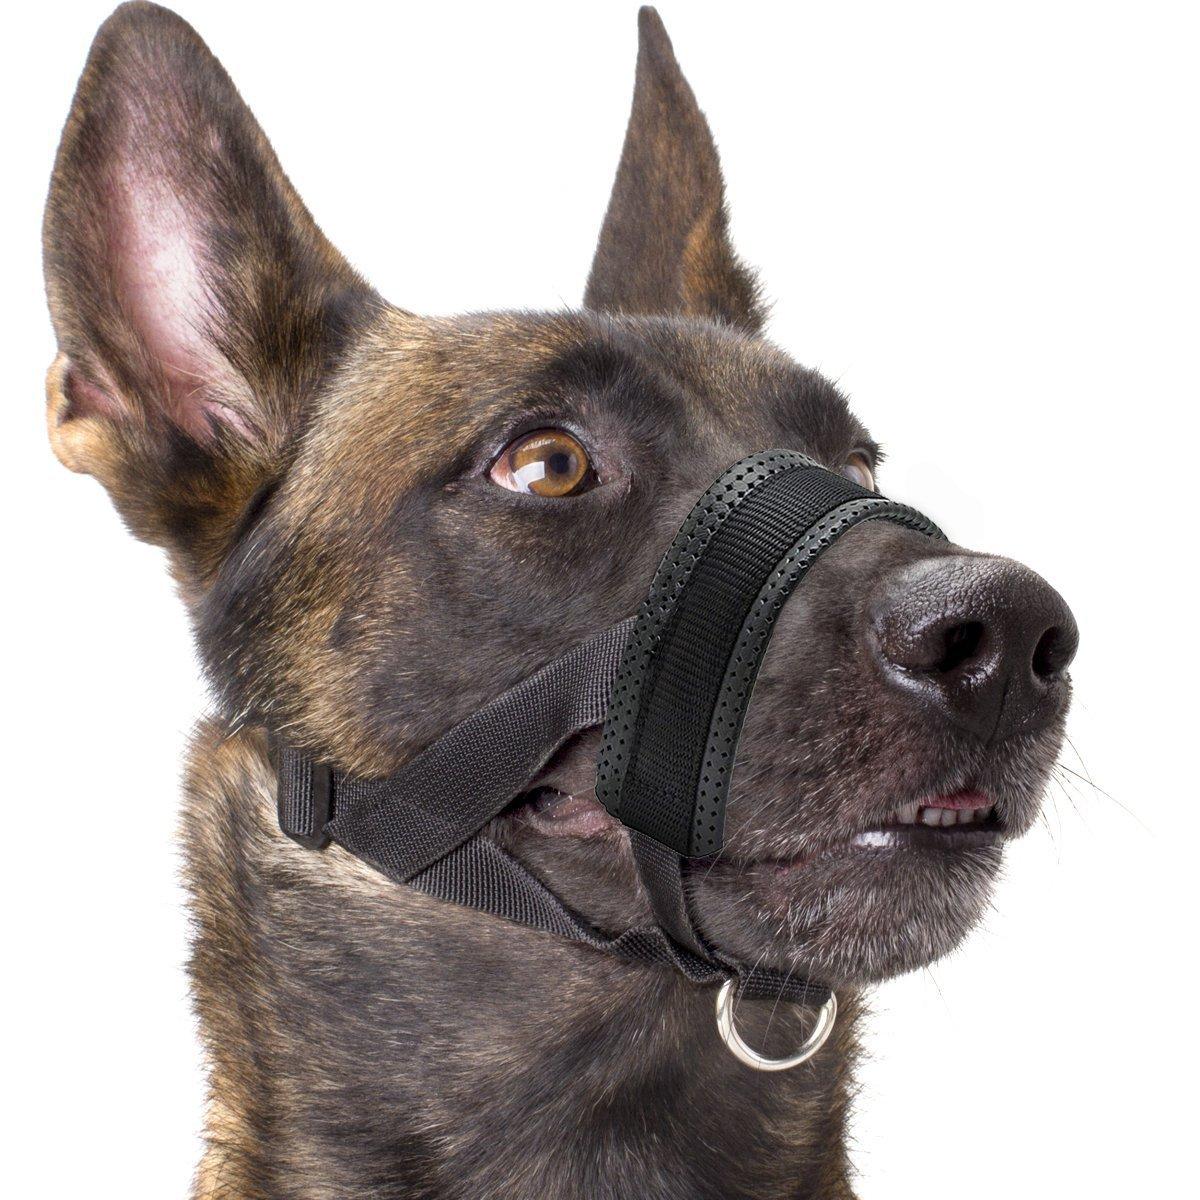 Dog Muzzle Nylon with Soft Padding, Adjustable Loop, Black (L)